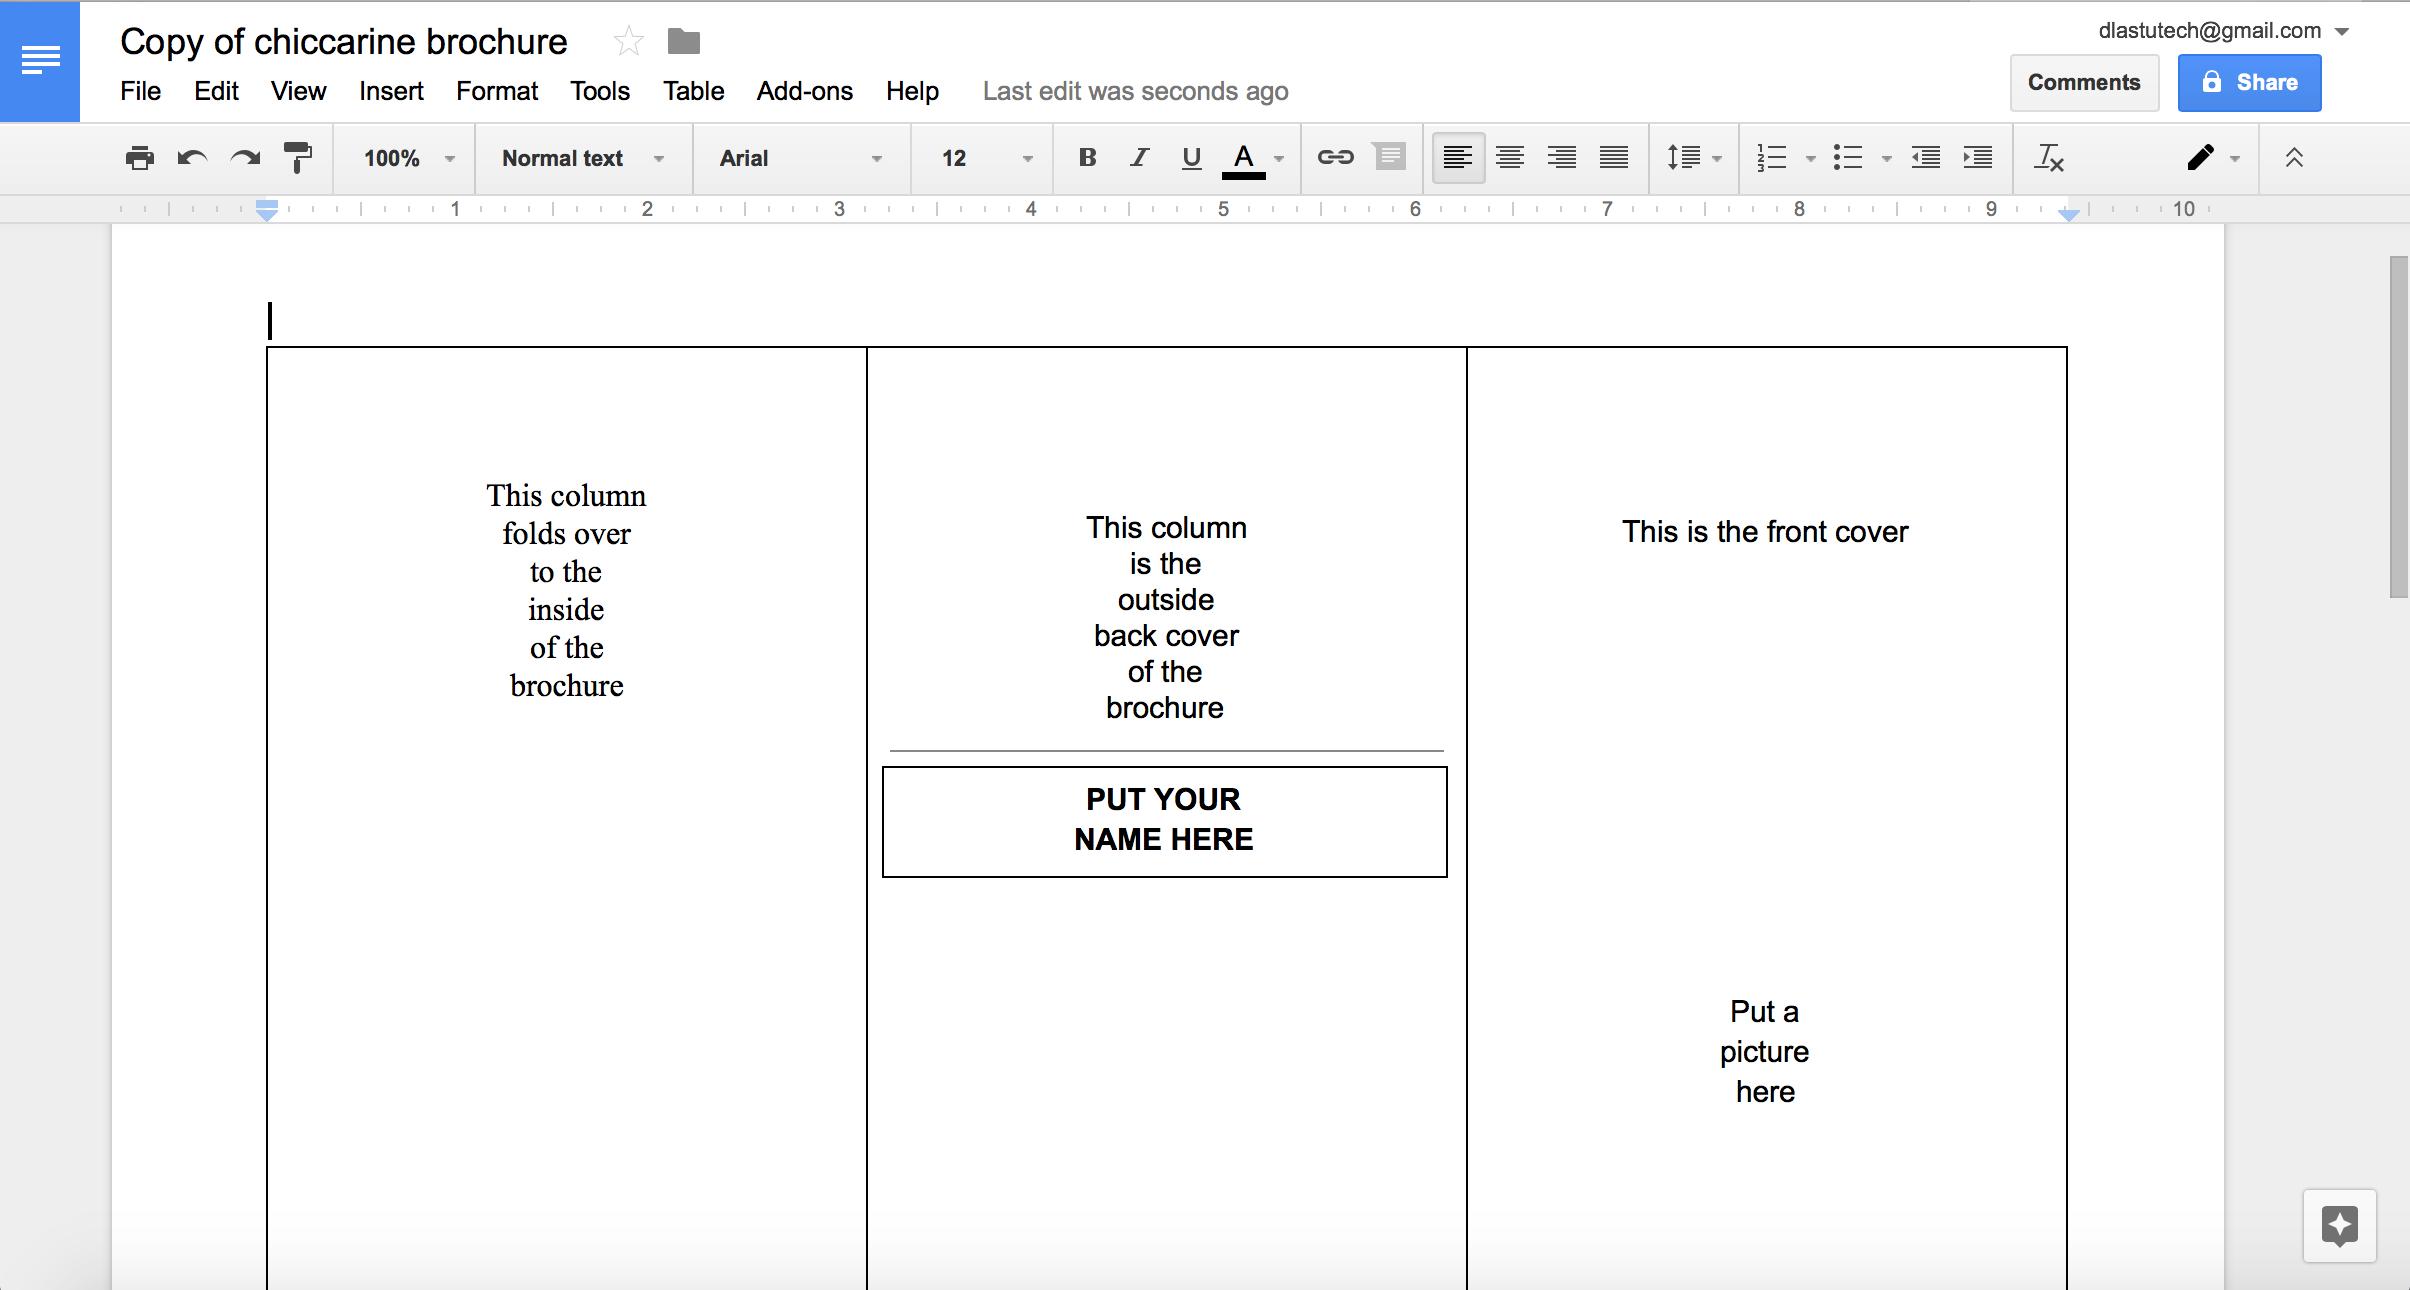 007 Tri Fold Template Google Docs Brochure Templates Luxury With Regard To Brochure Templates Google Docs